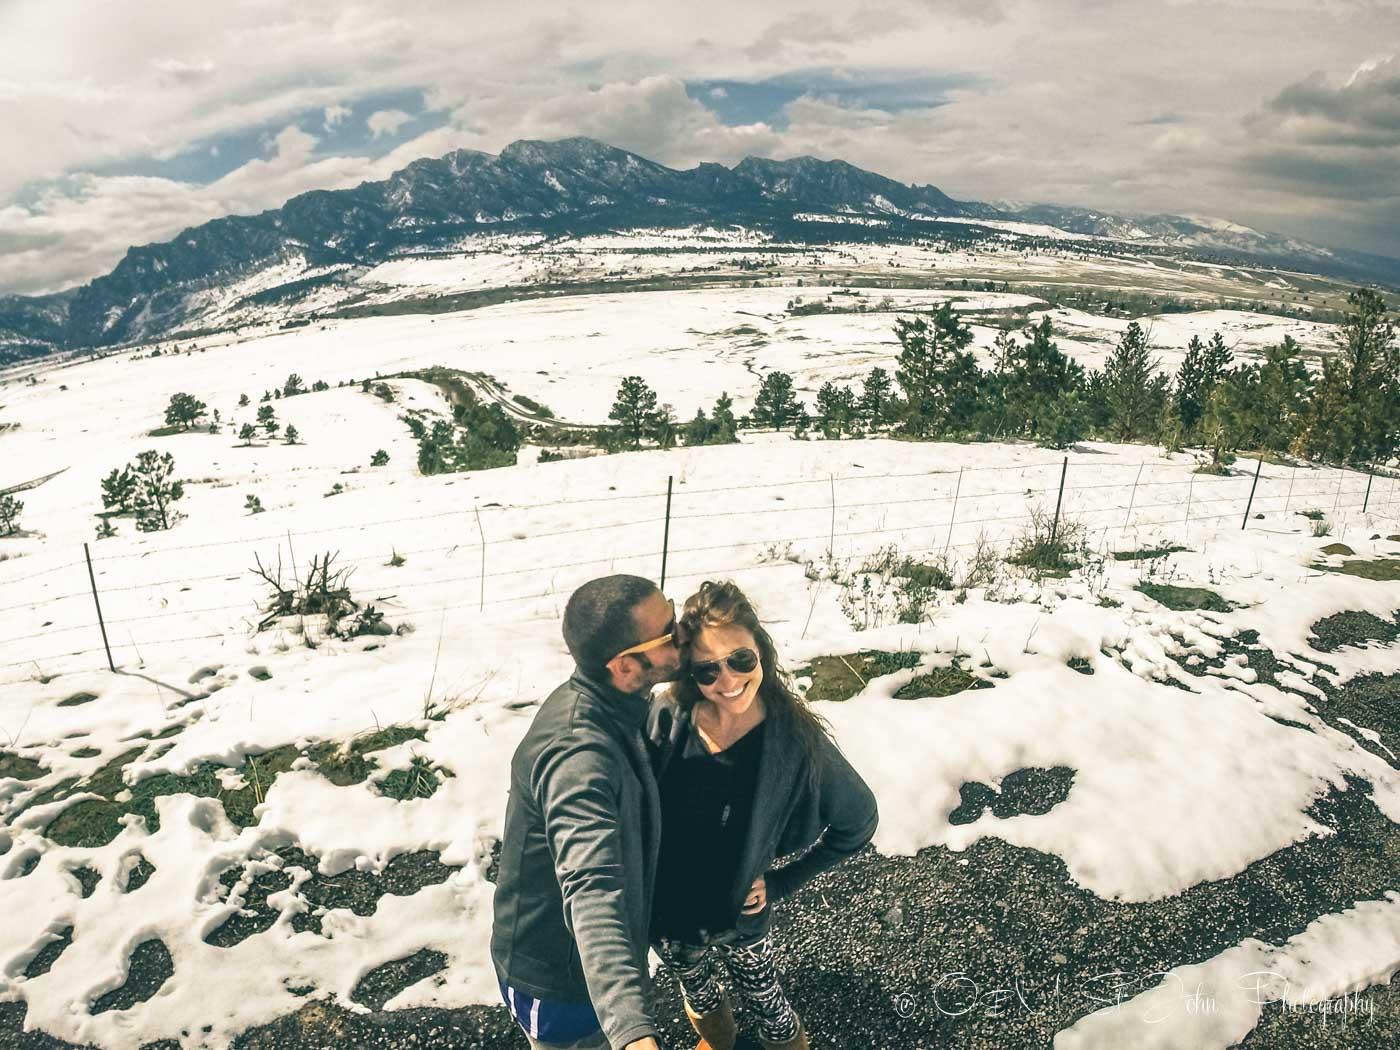 Max & Oksana overlooking Rocky Mountains in Colorado. USA. Road Trip